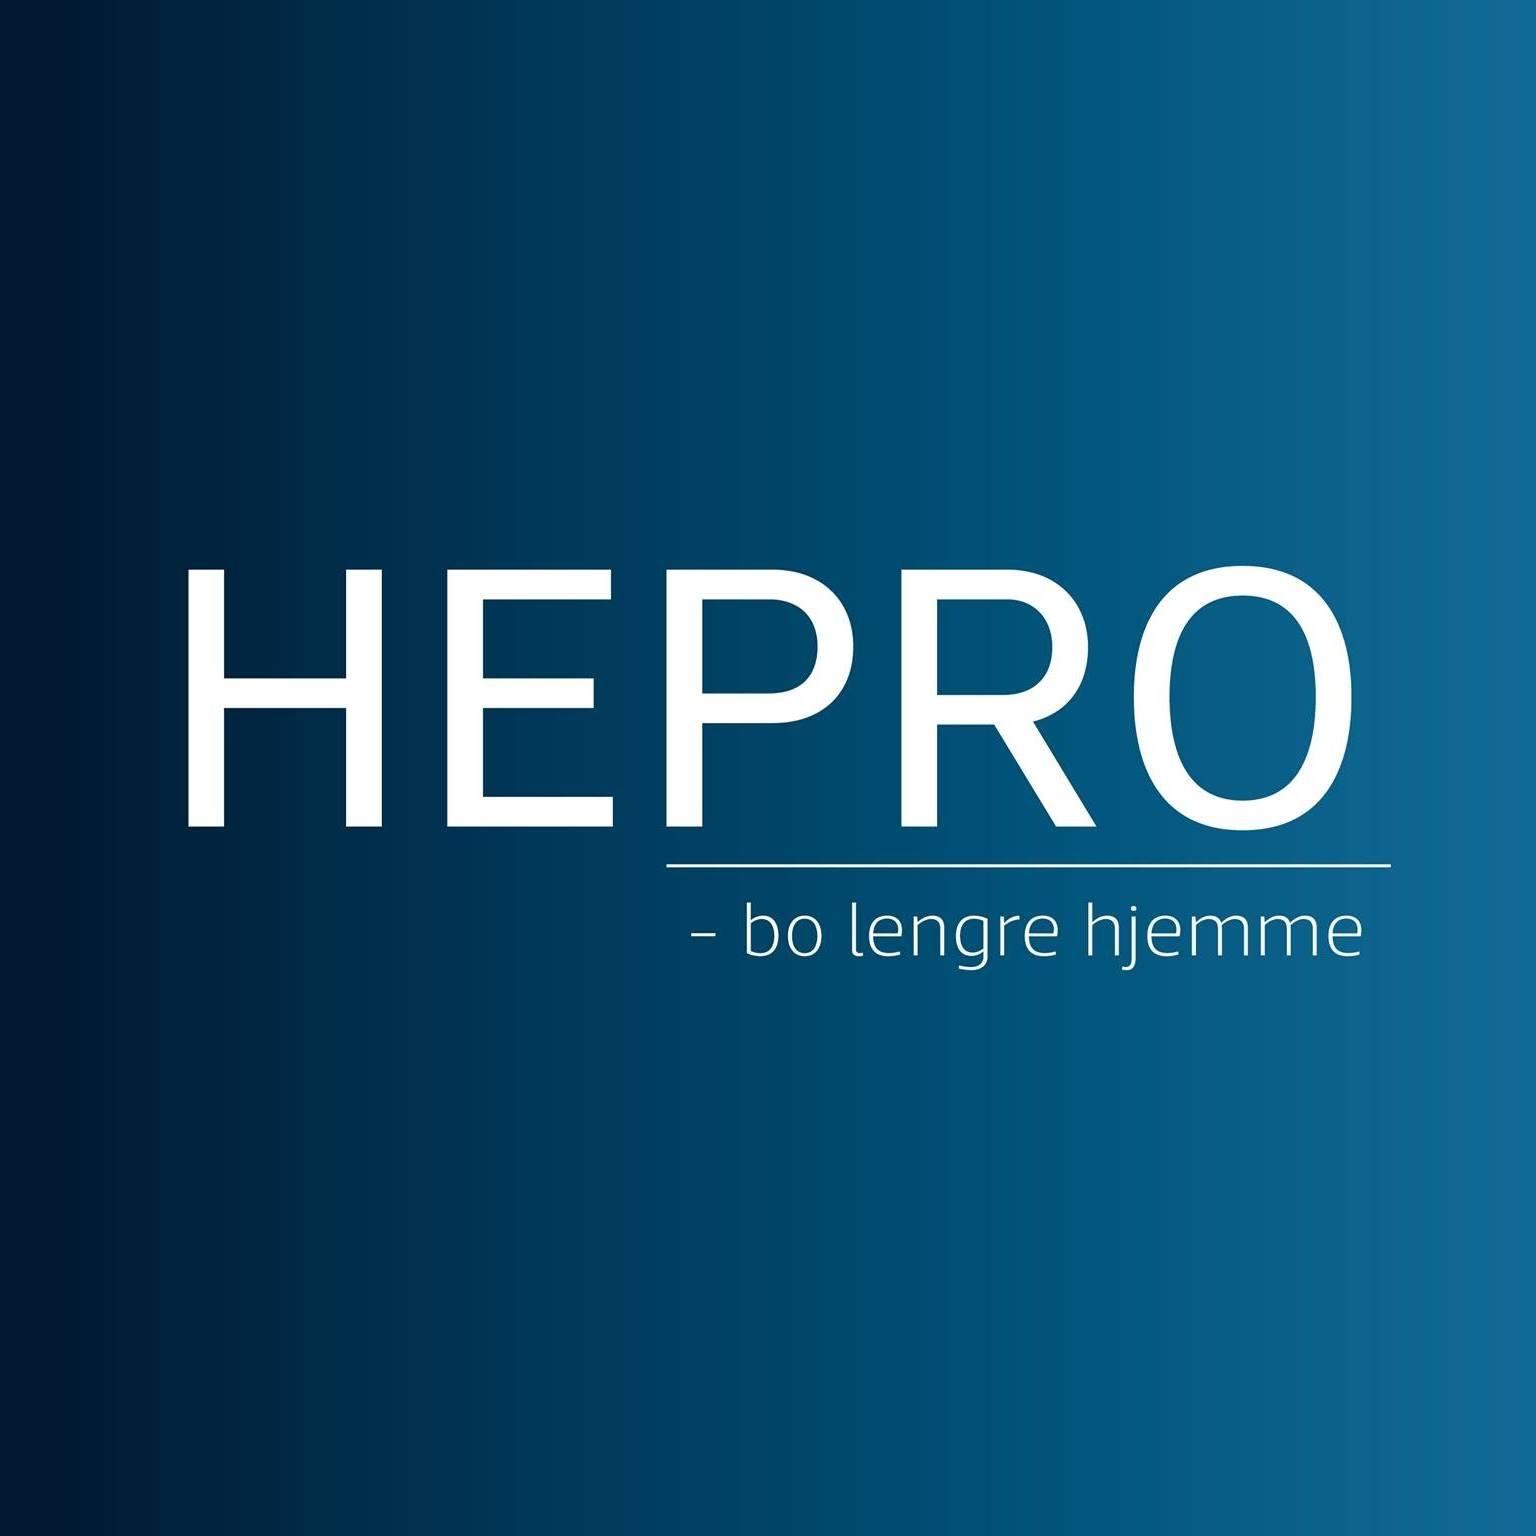 Hepro AS